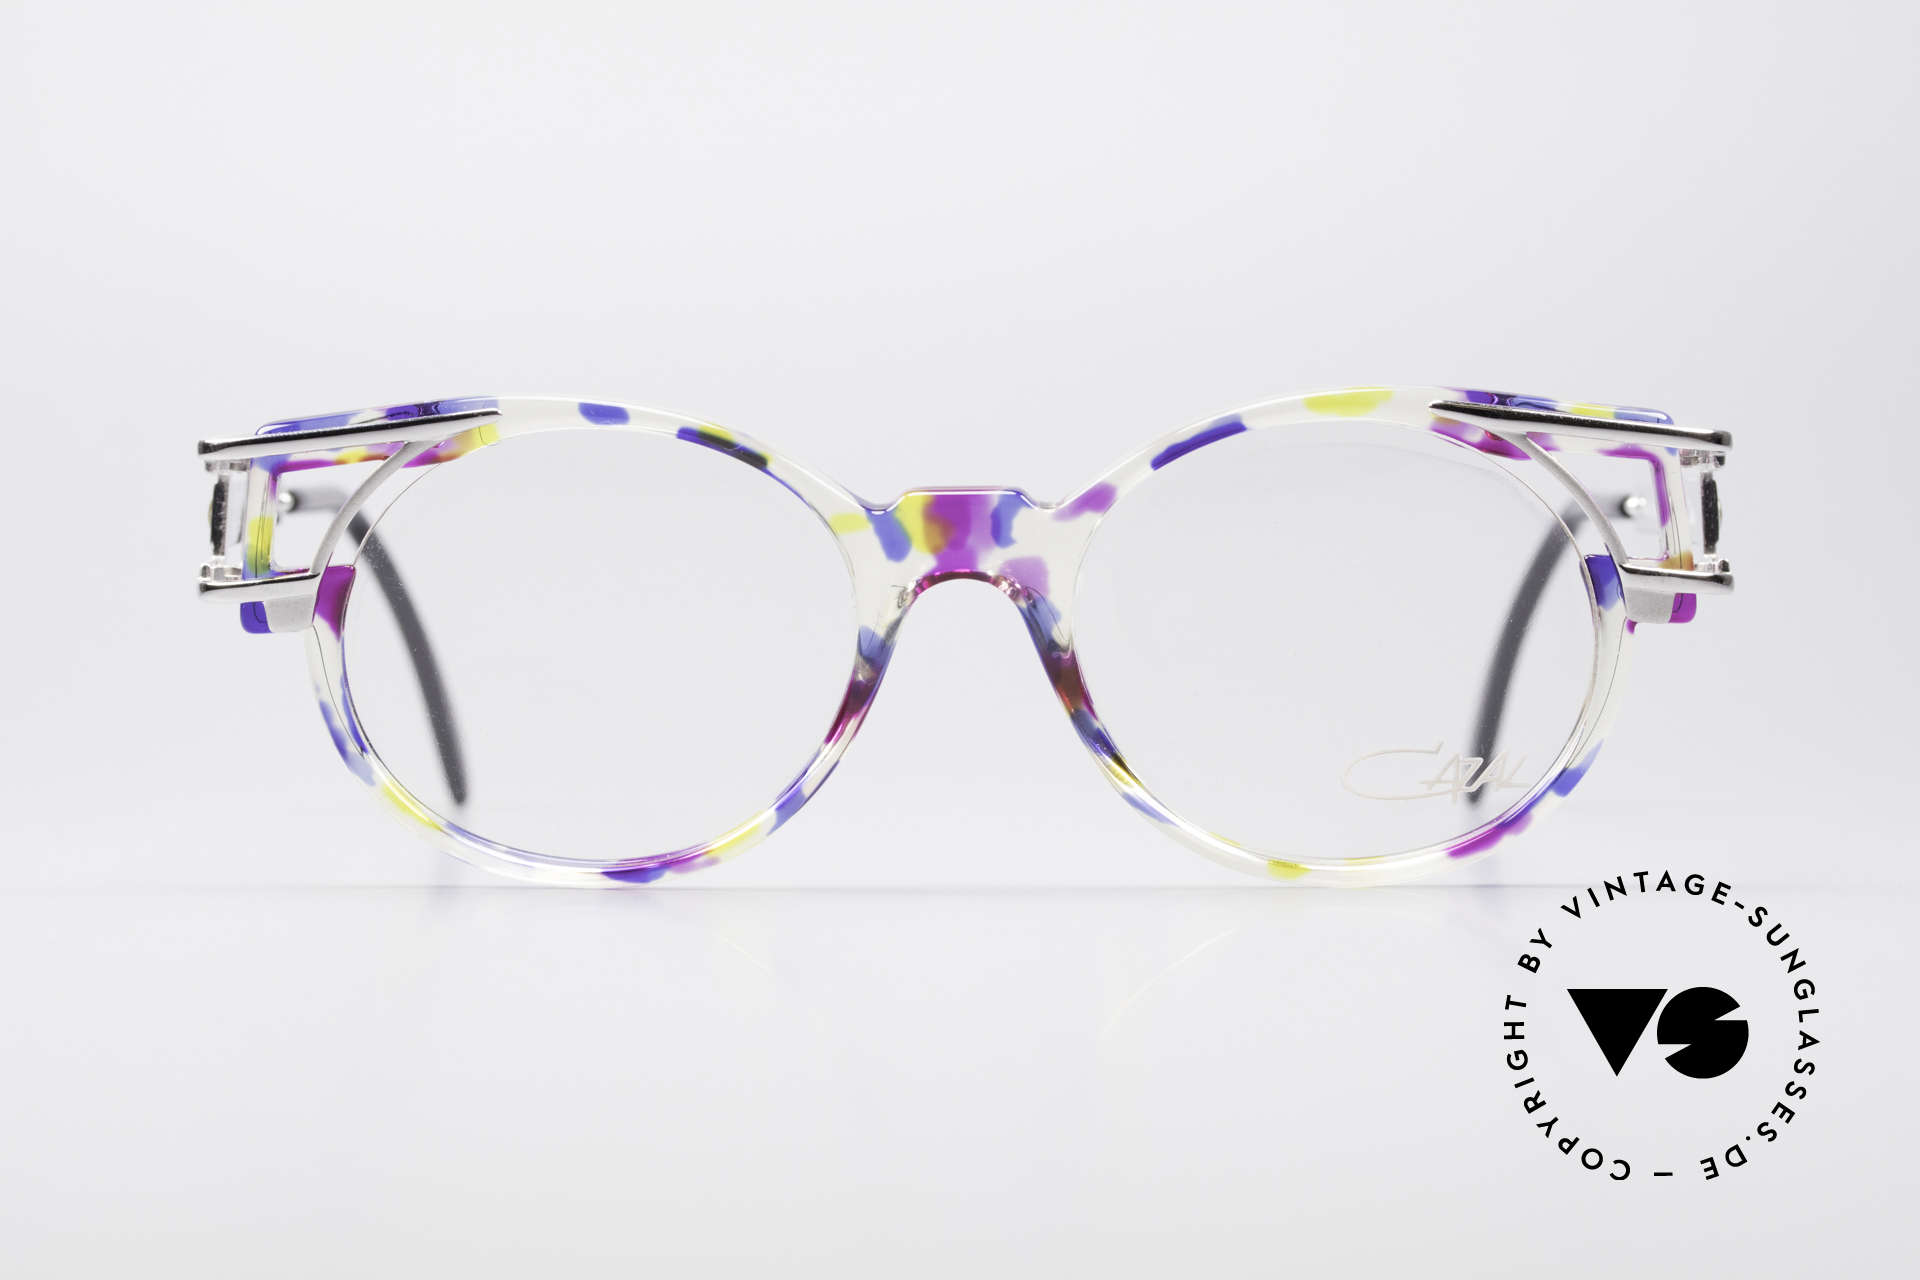 Cazal 353 Old School Hip Hop Frame, at that time, the HIP-HOP eyeglasses par excellence, Made for Men and Women